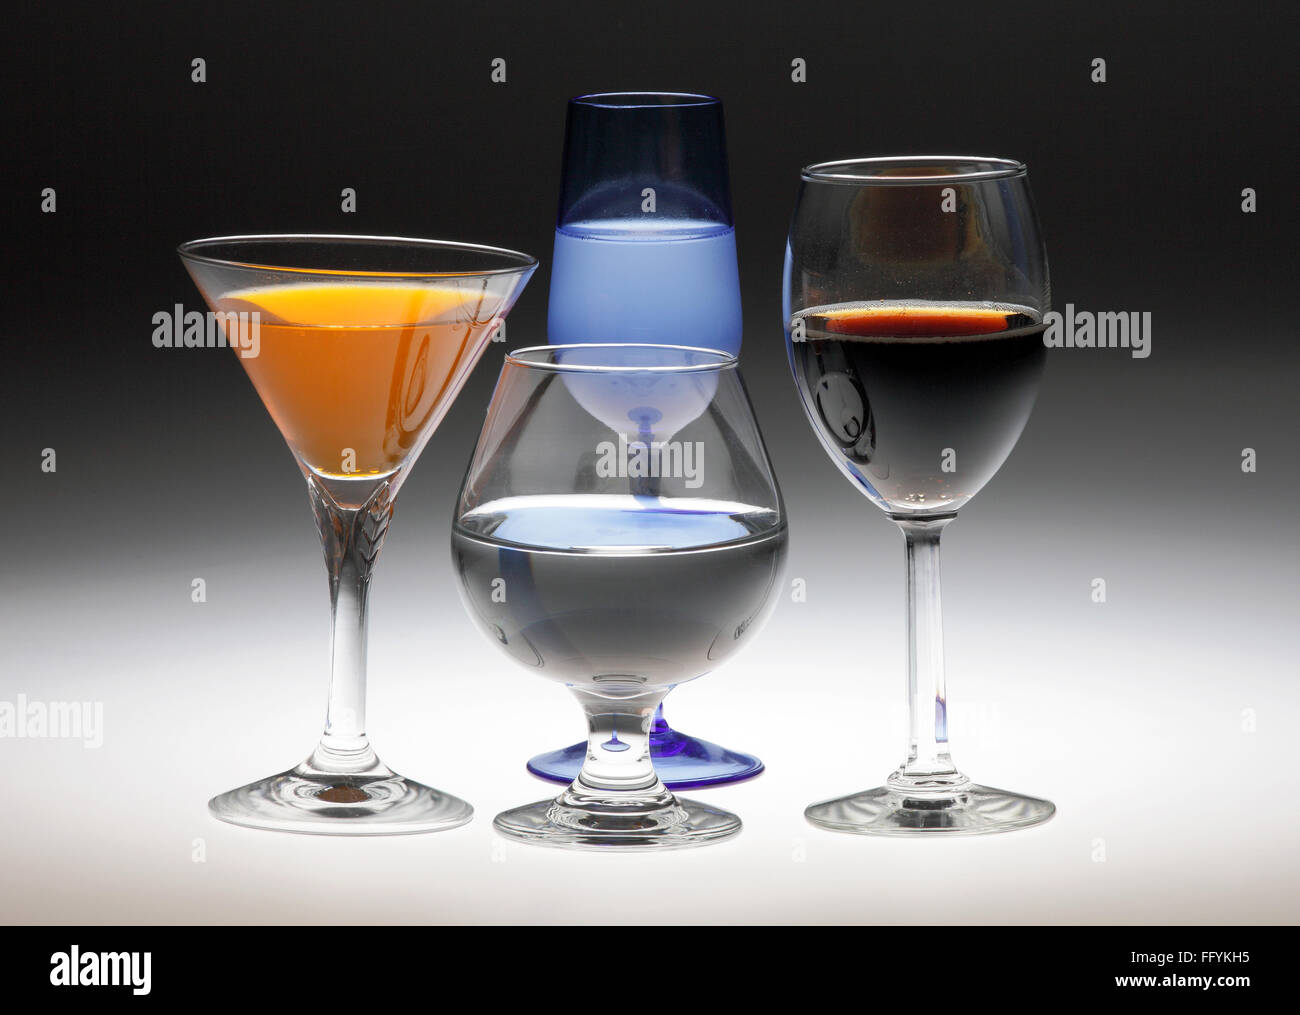 Vasos de vidrio de la India Imagen De Stock